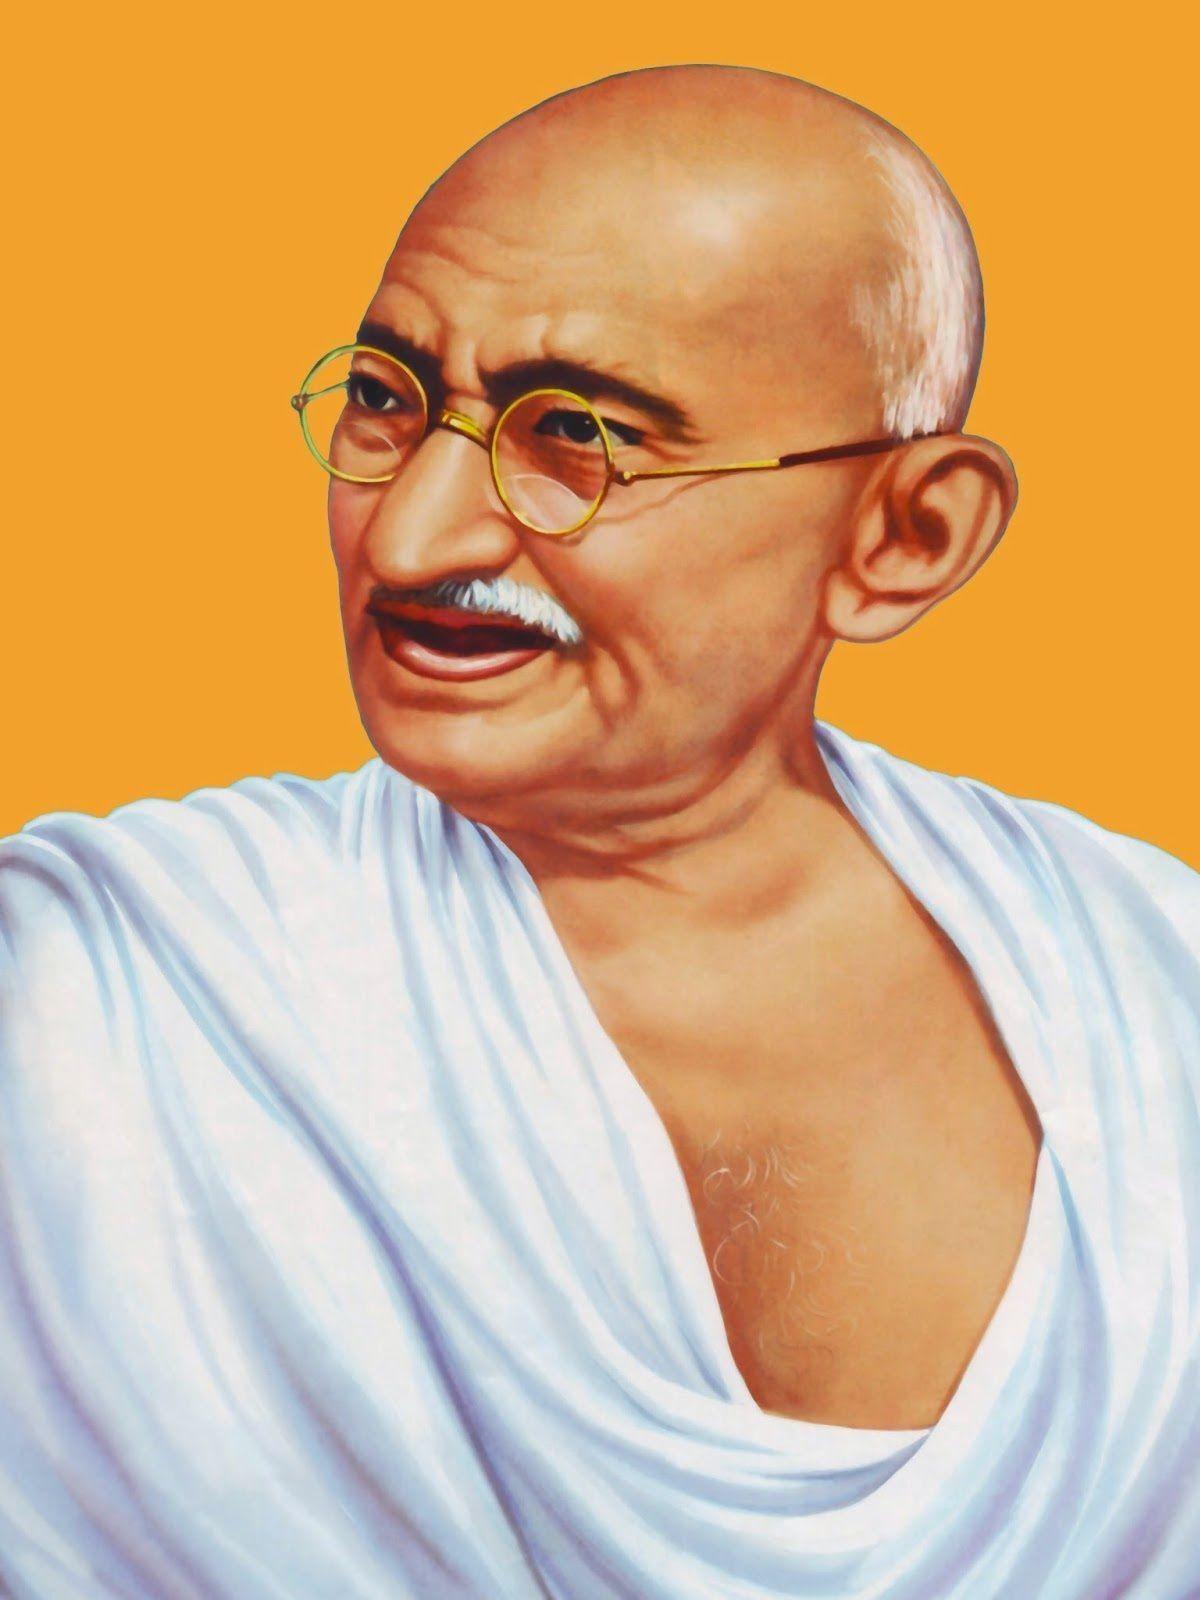 Mahatma Gandhi 2020 2 October 1869 Mohandas Karamchand Gandhi Father Of The Nation In 2020 Mahatma Gandhi Photos Wallpaper Pictures Mahatma Gandhi